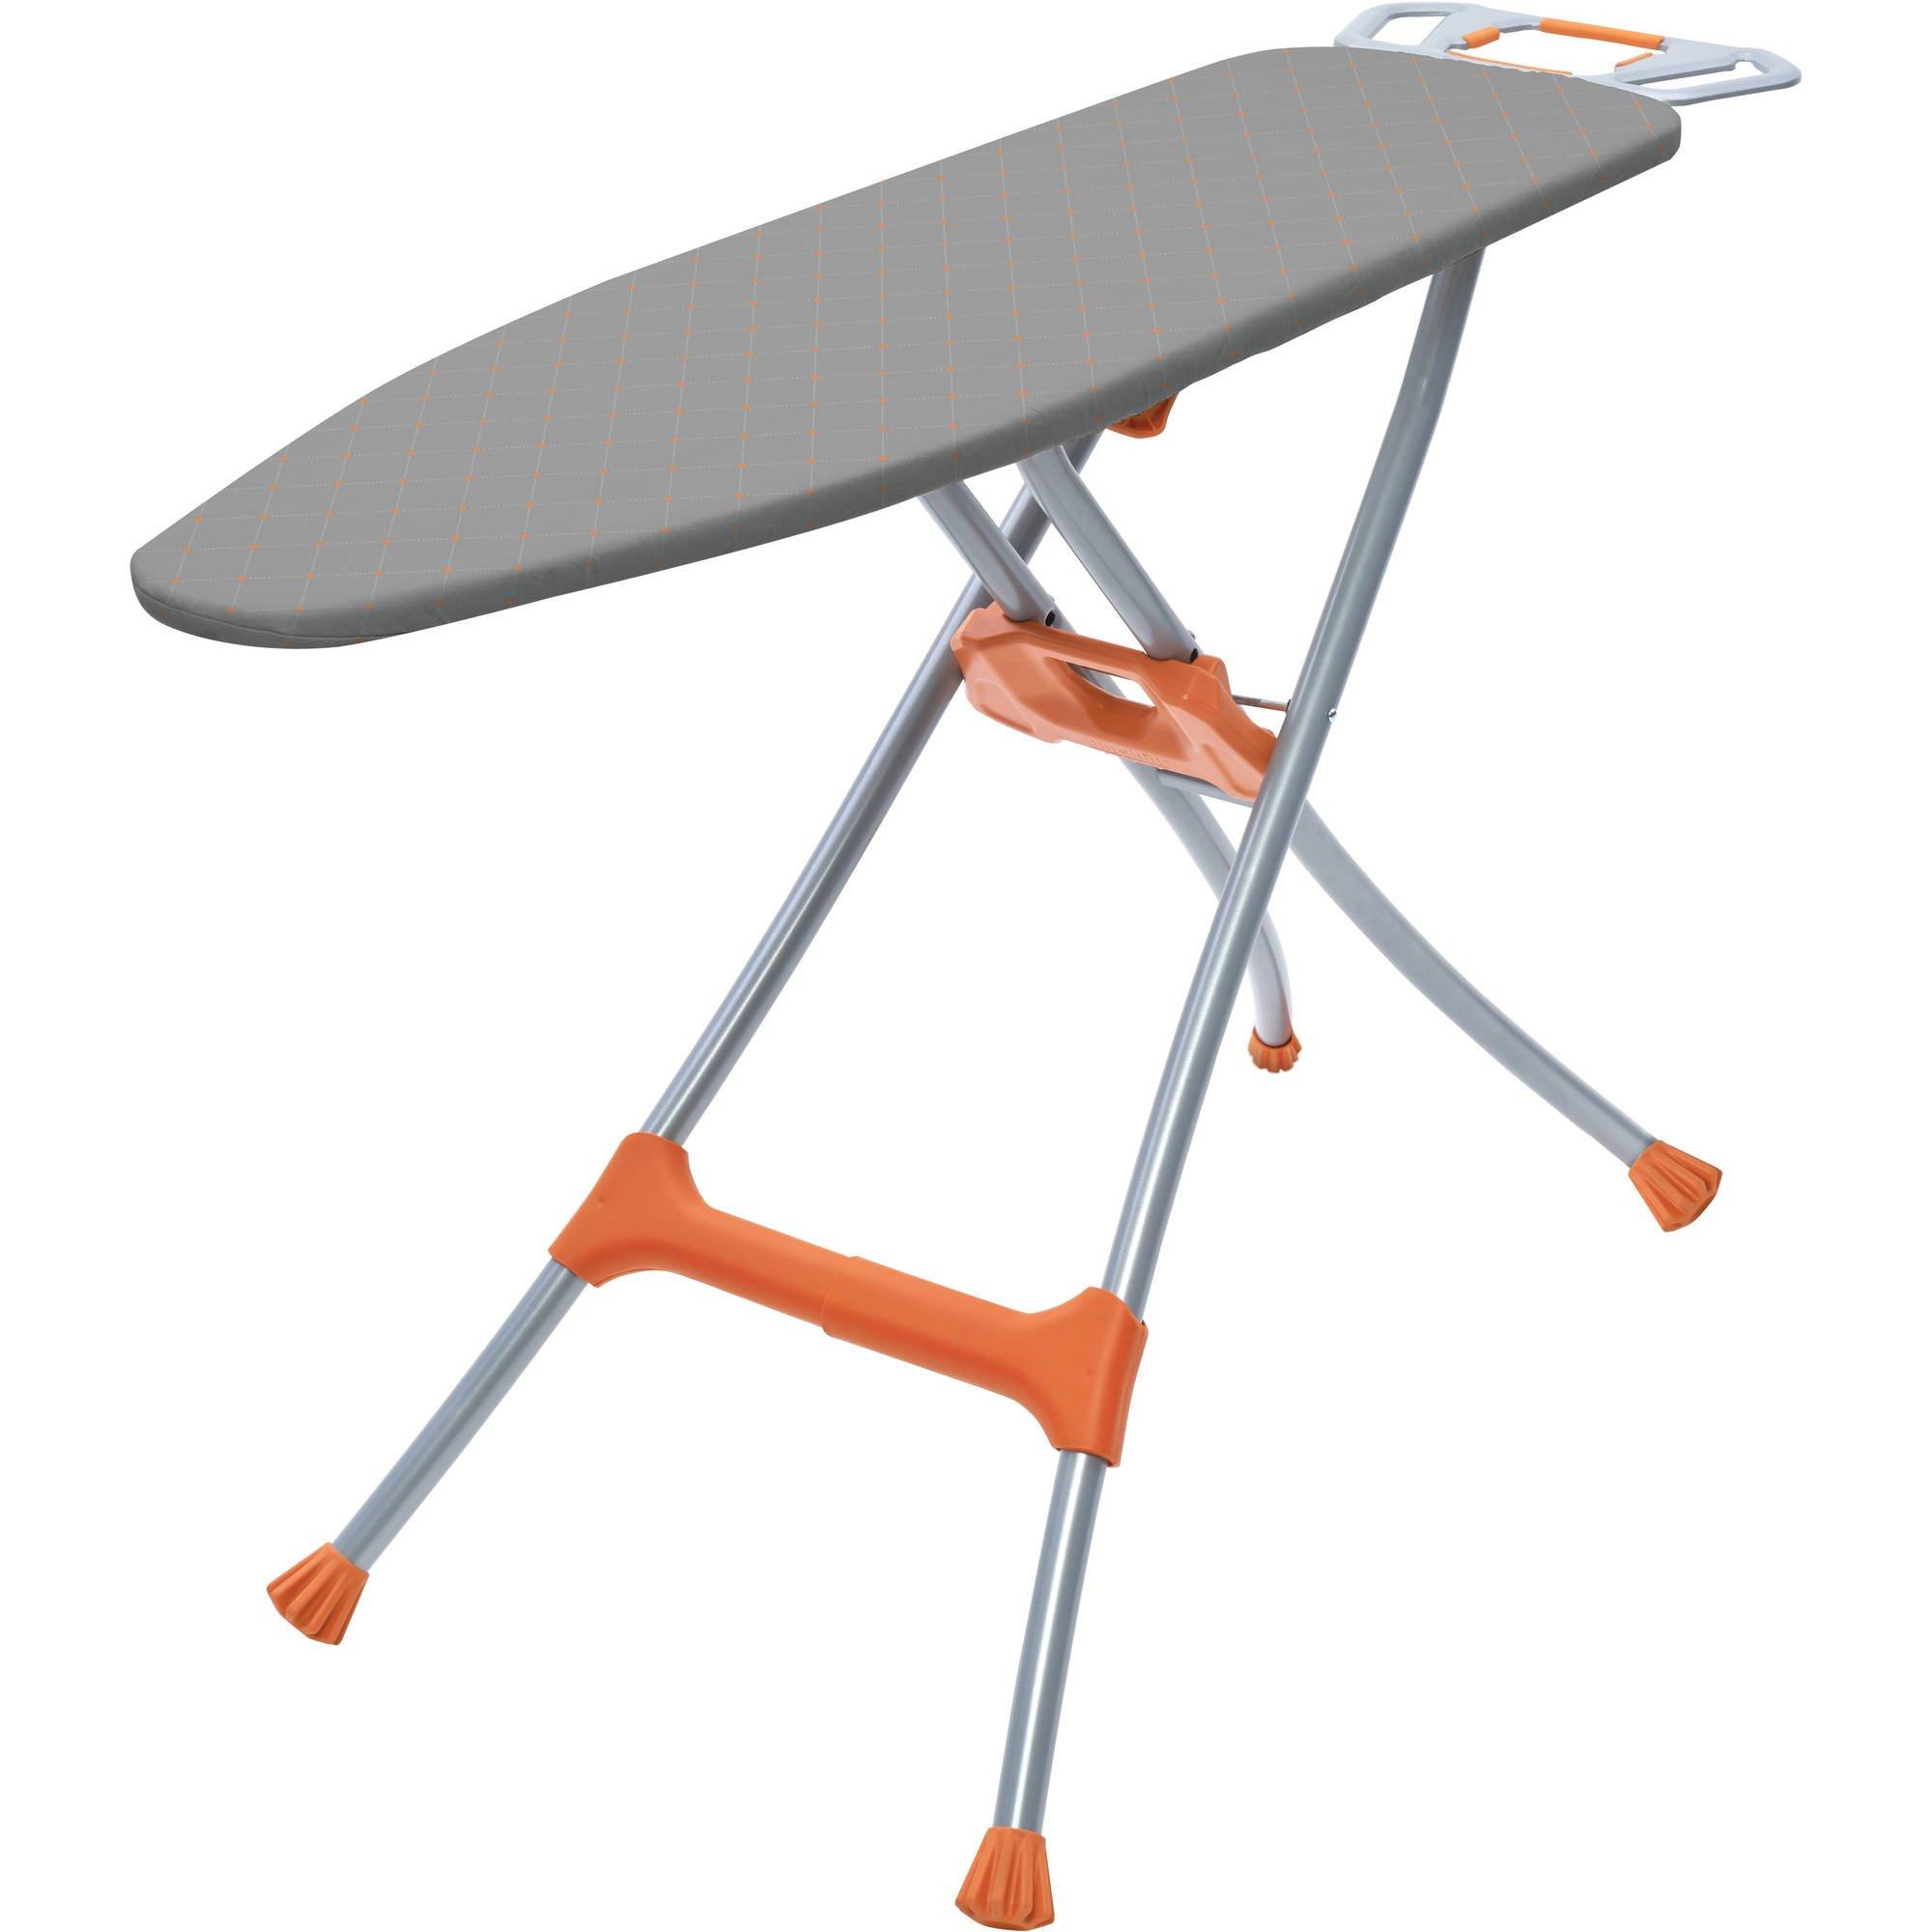 Lear Siegler Seymour Corp. Homz Durabilt Premium Steel Top Ironing Board, Gray